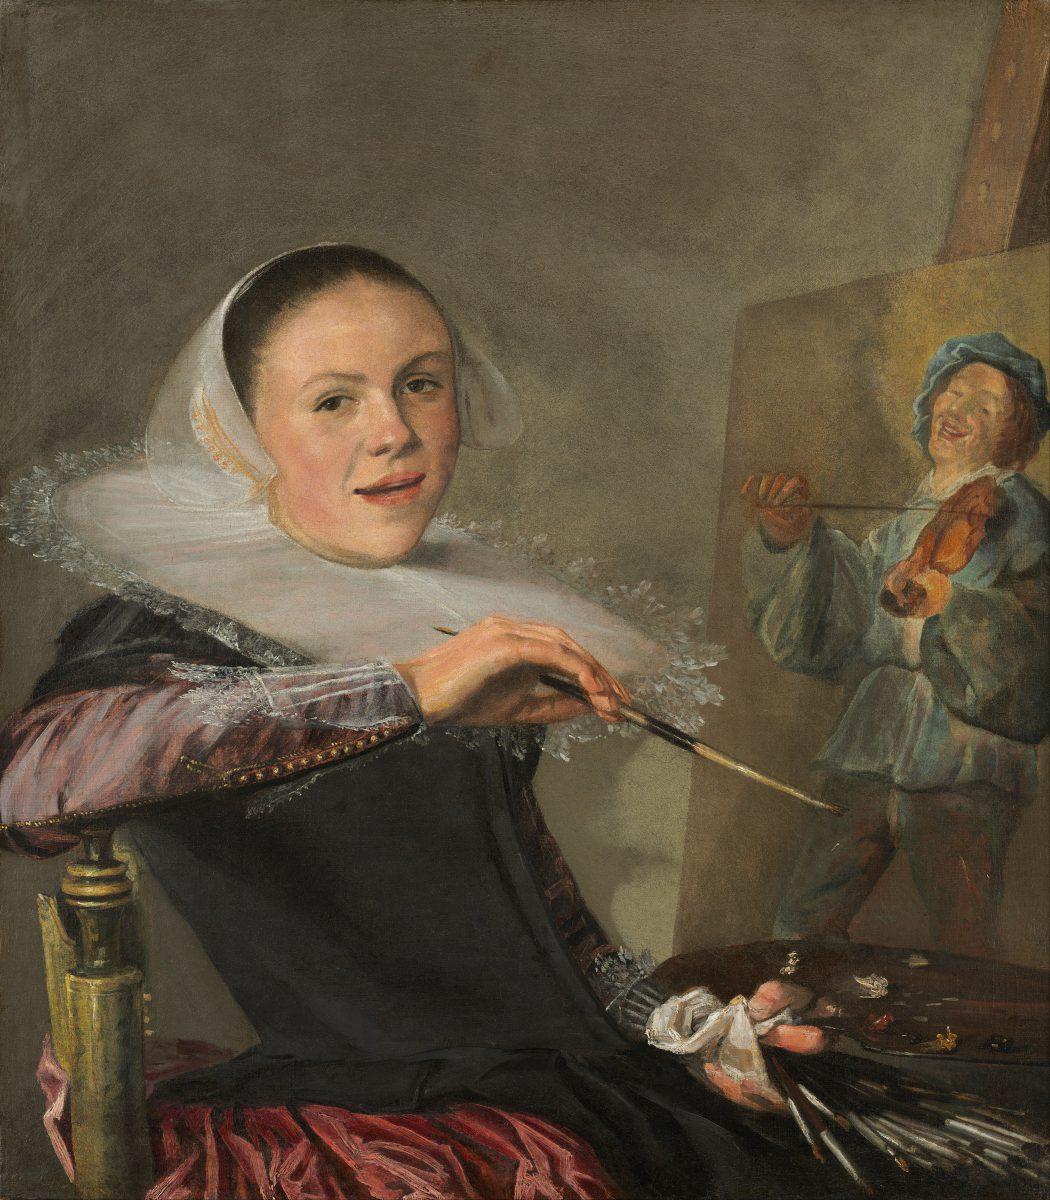 Judith-Leyster-Autoportrait-1633-1050x1200.jpg